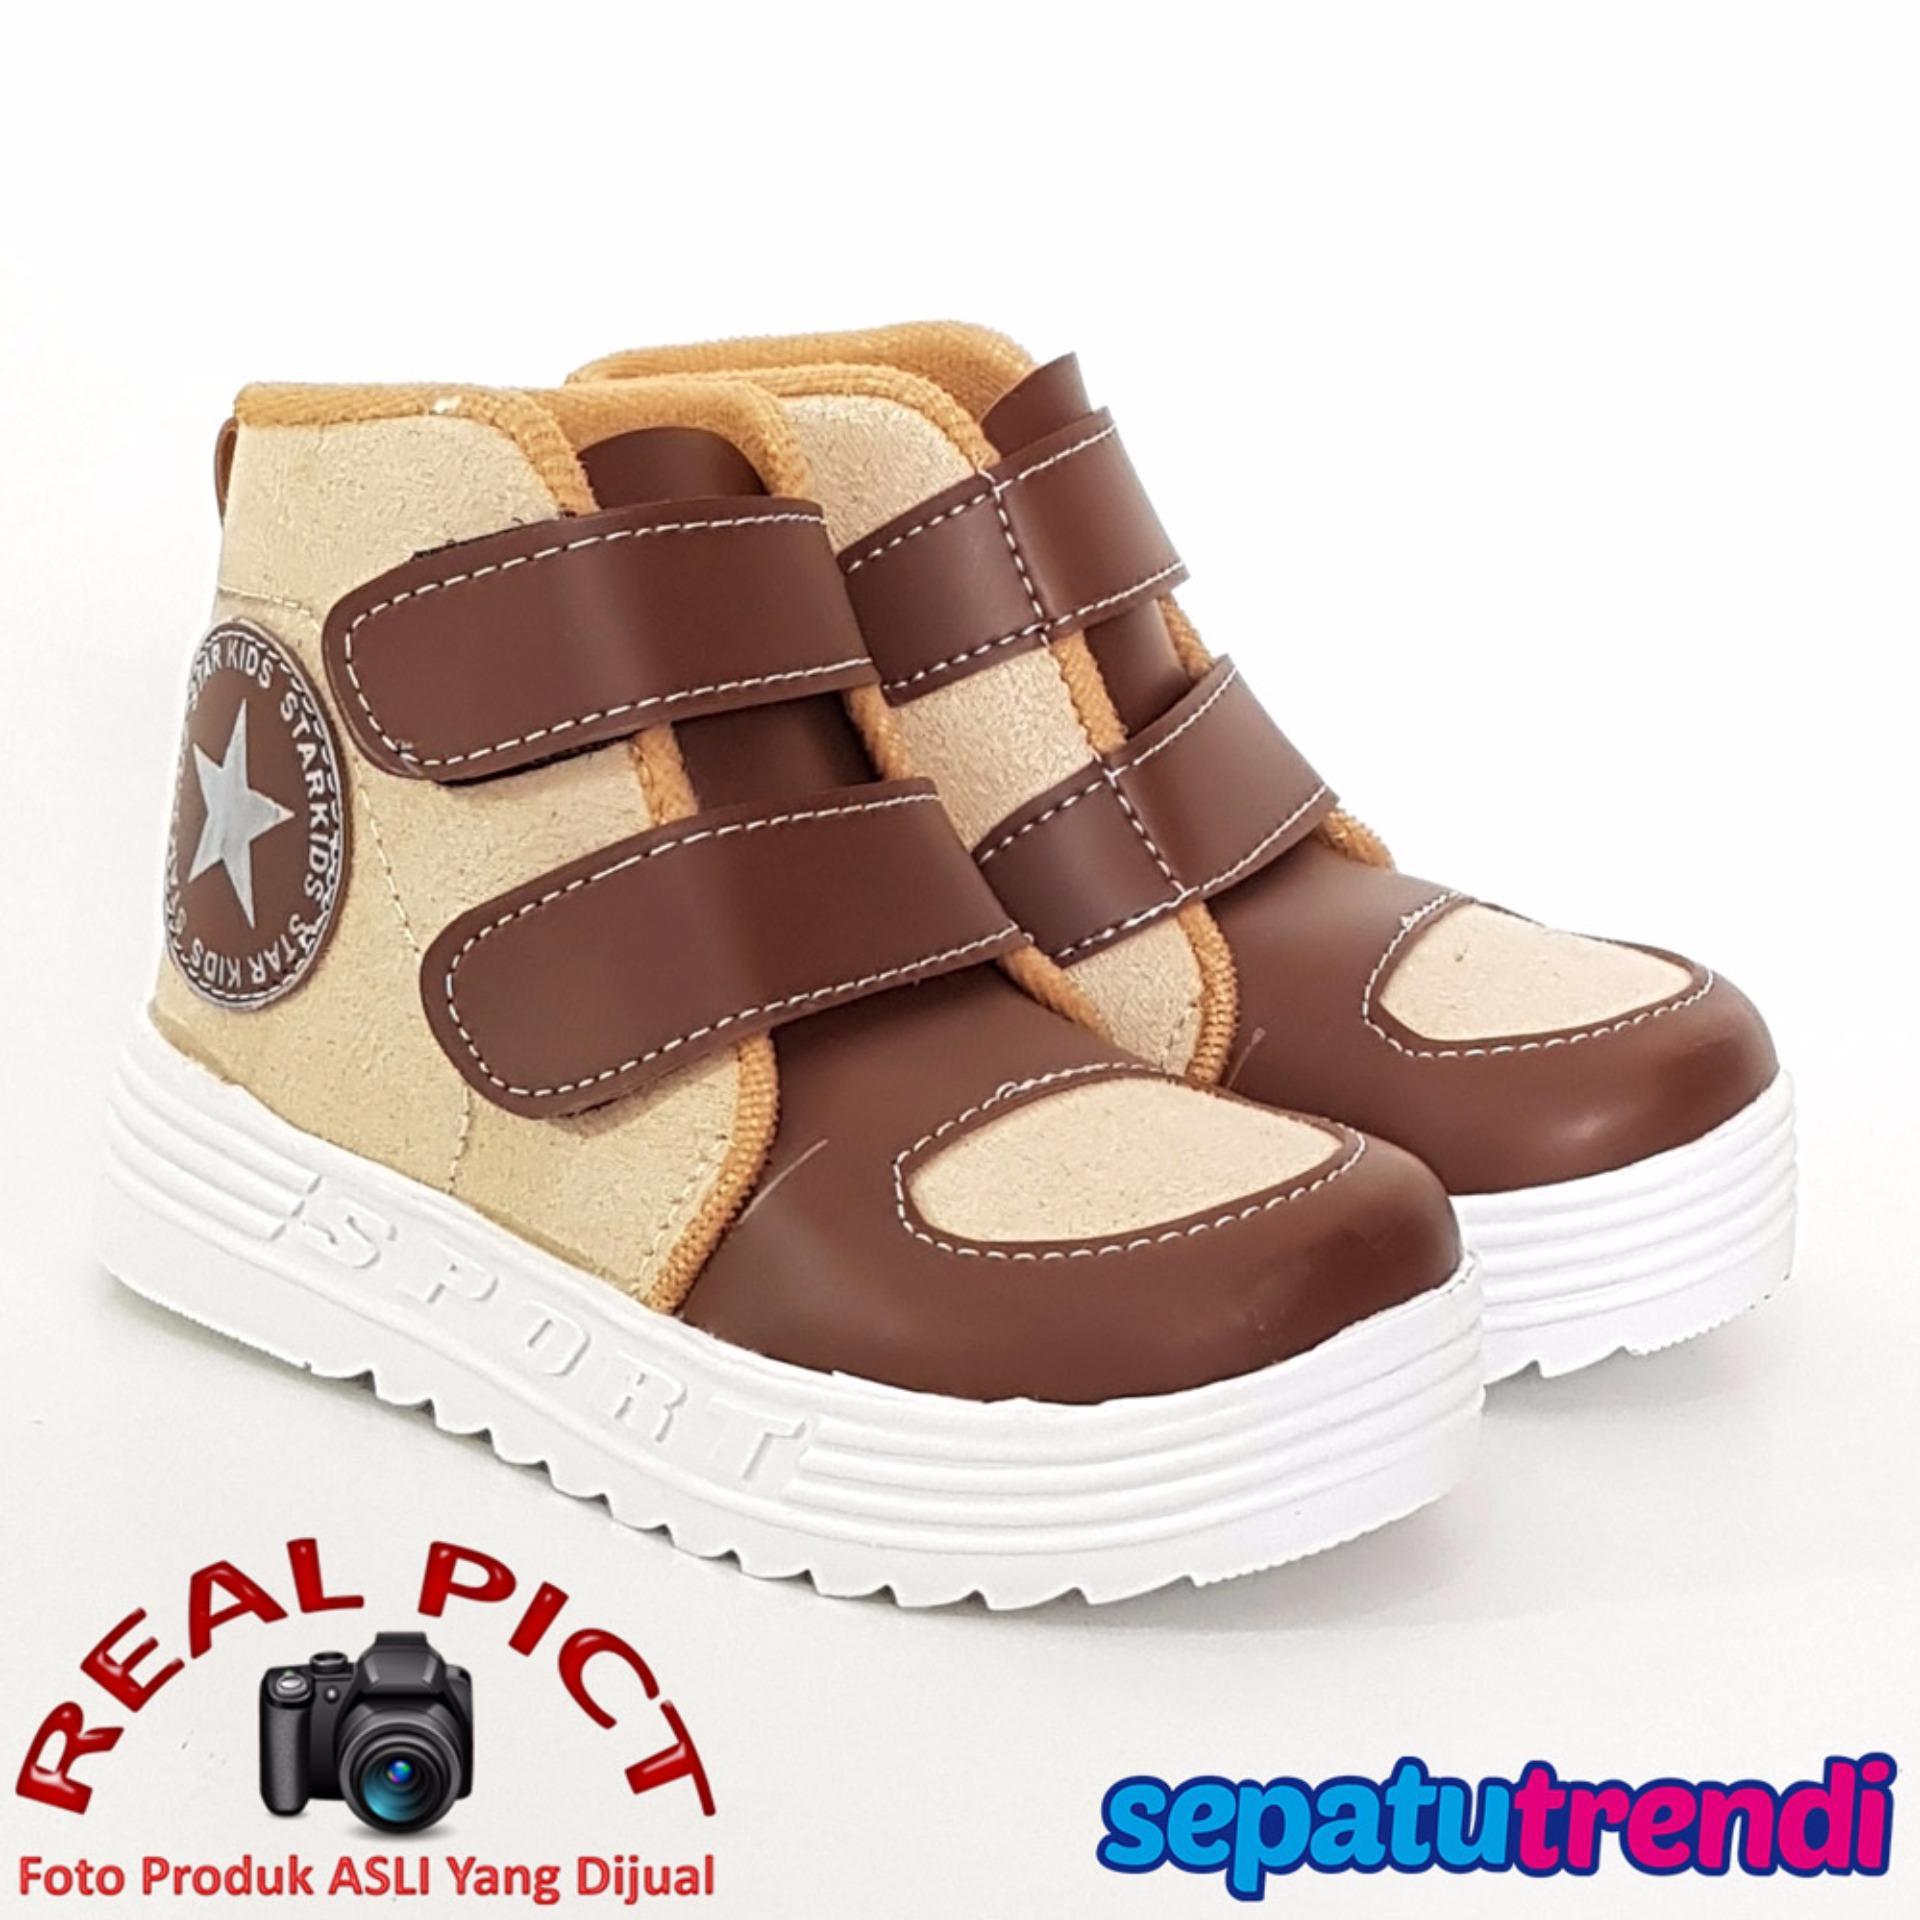 Ulasan Trendishoes Sepatu Boot Anak Laki Laki Star Suede Starsmp Beige Brown